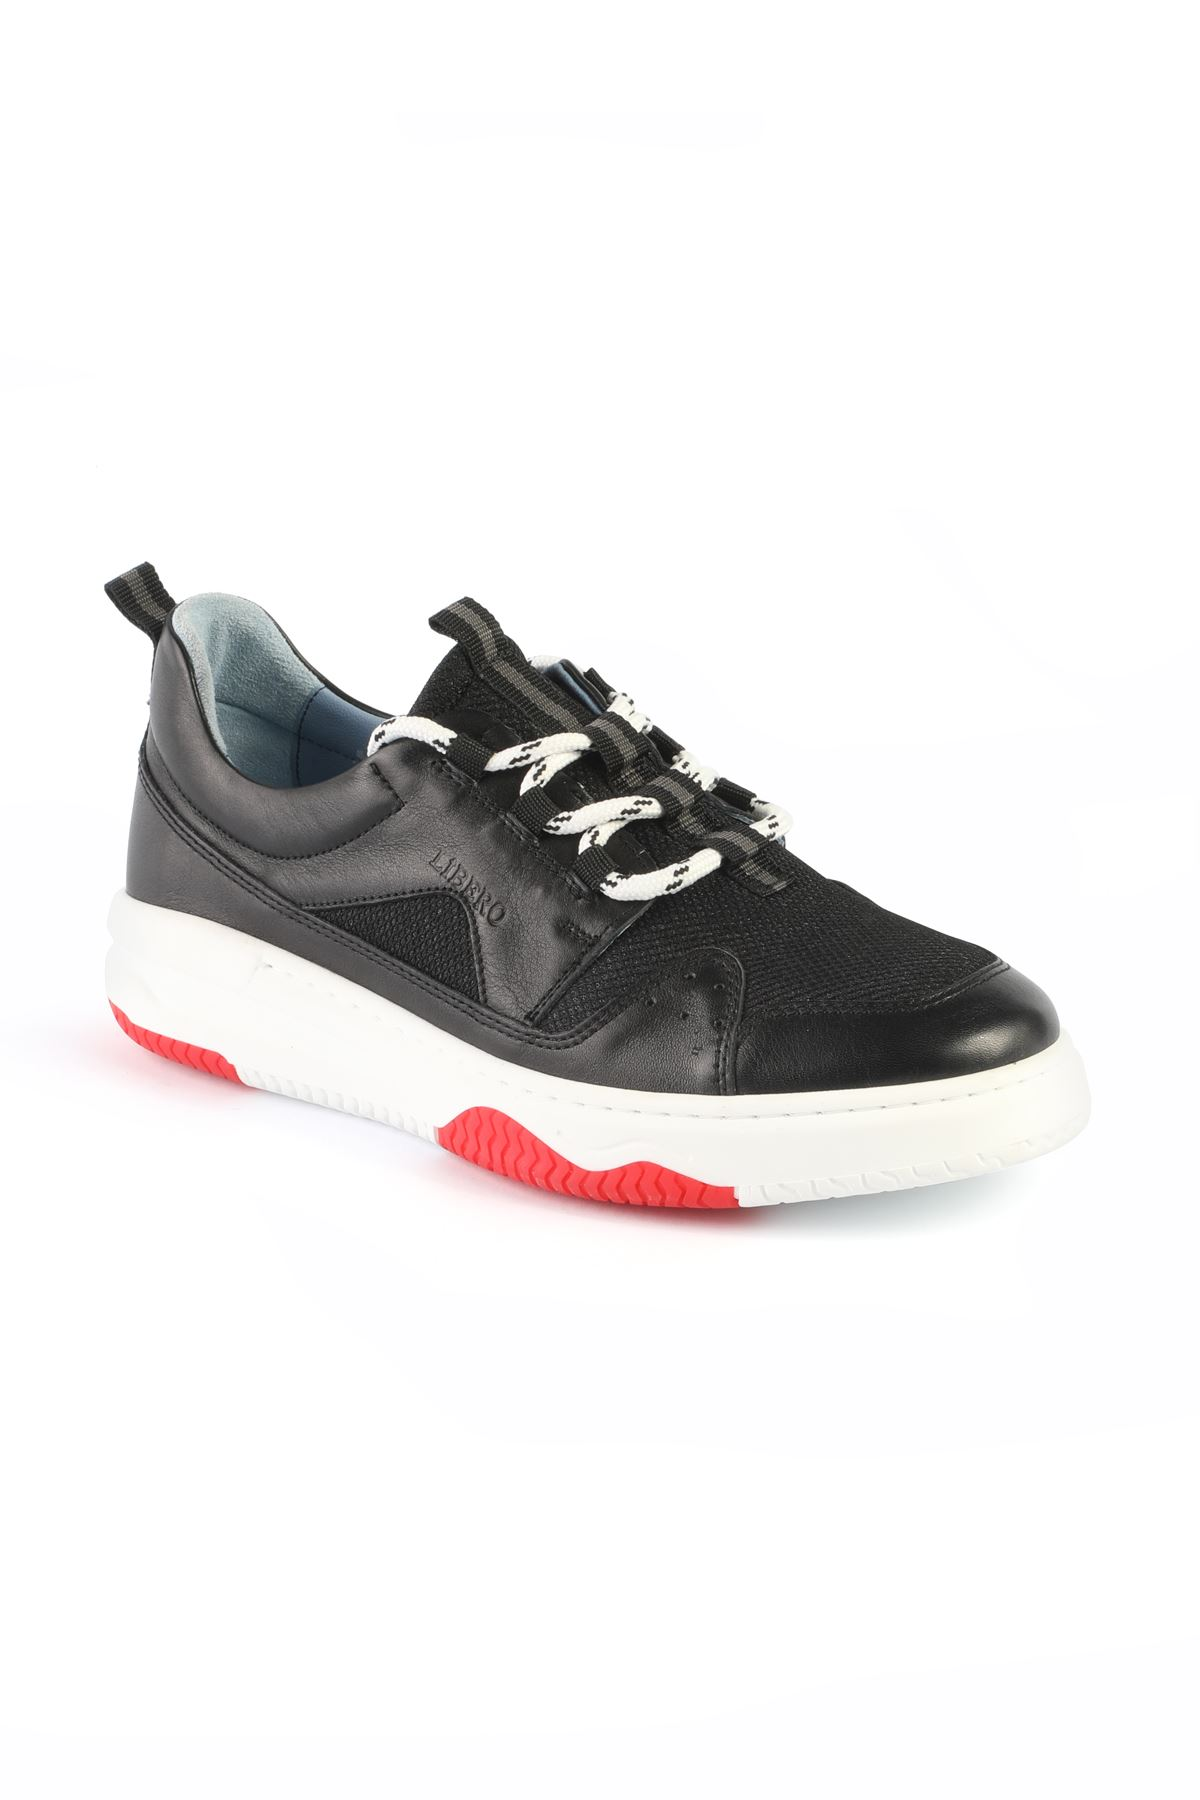 Libero L3341 Black Sports Shoes